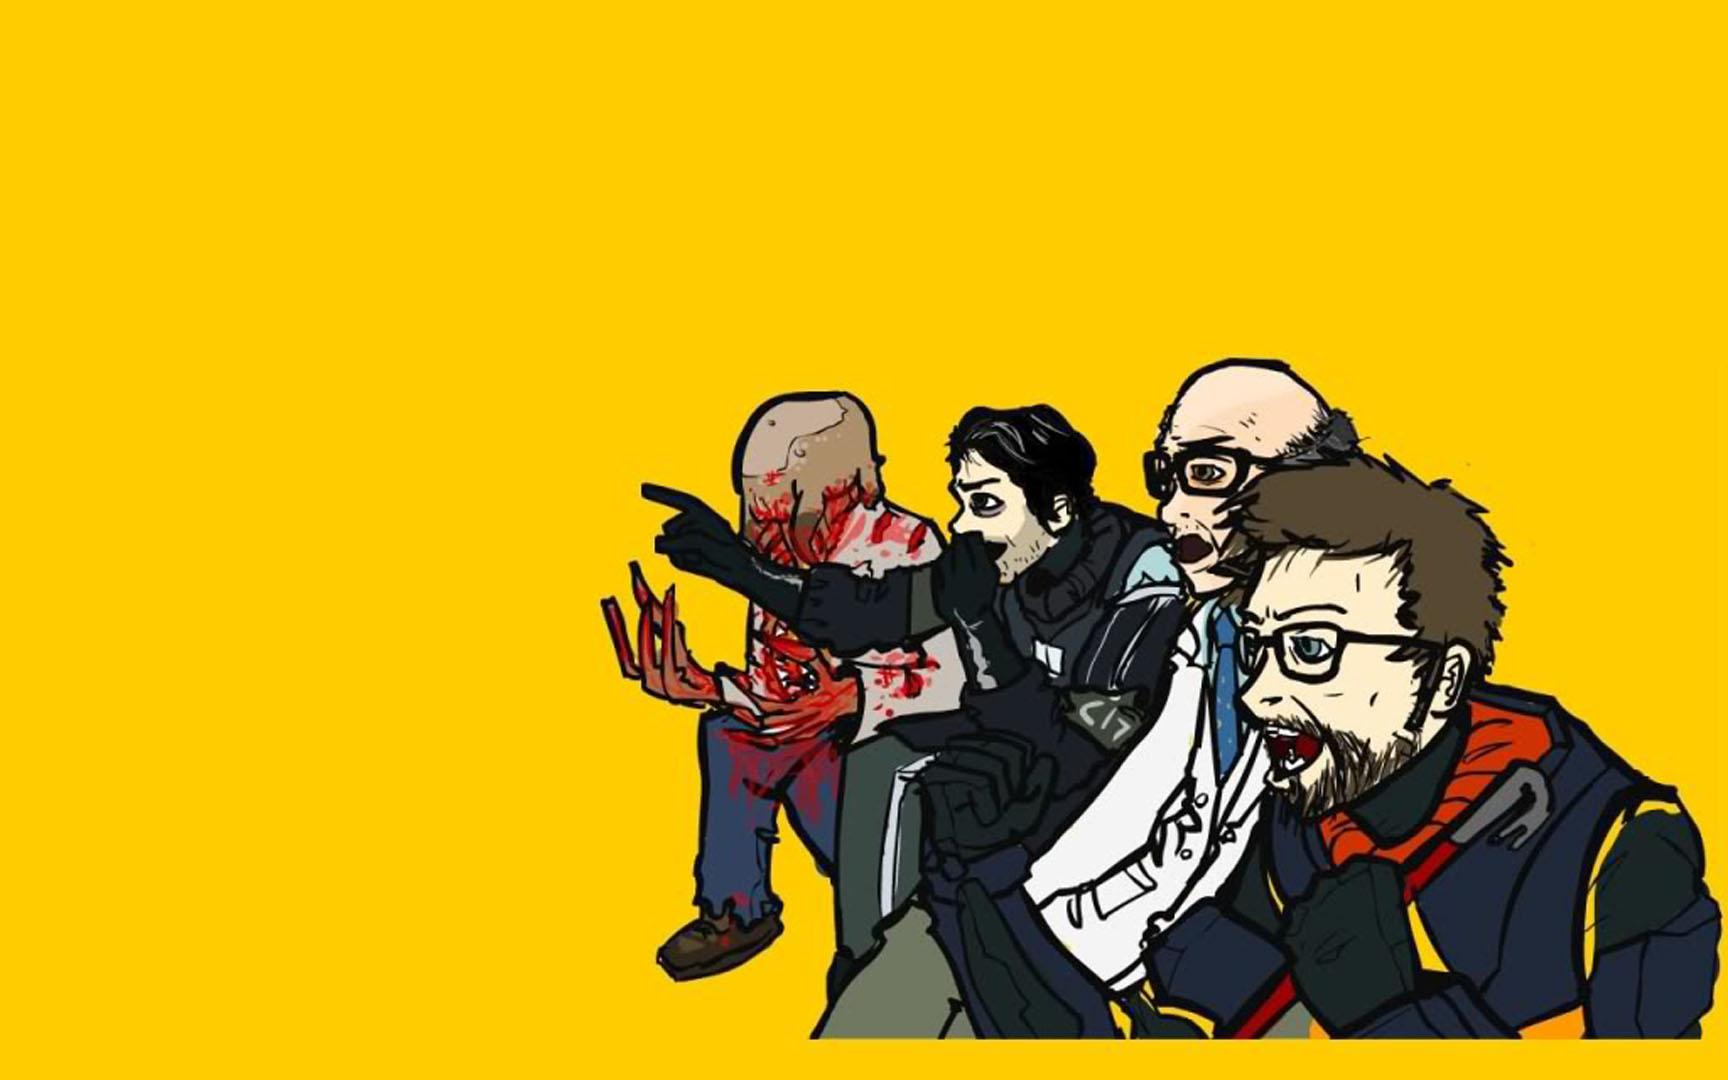 Animated Thanksgiving Wallpaper Cartoon Halflife Half Life 2 Wallpaper